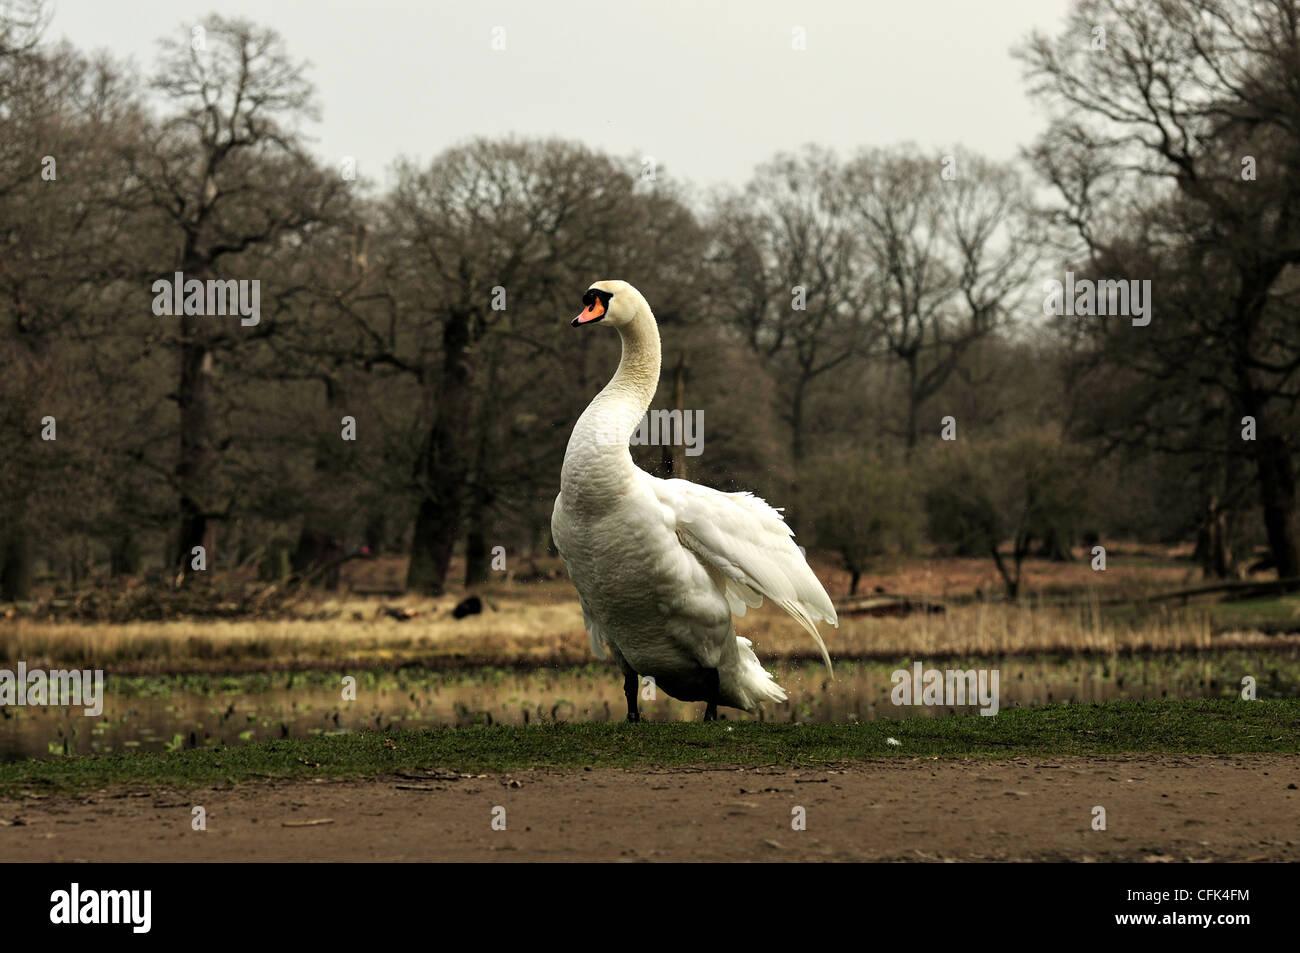 Mute swan at Dunham Massey shaking water off - Stock Image